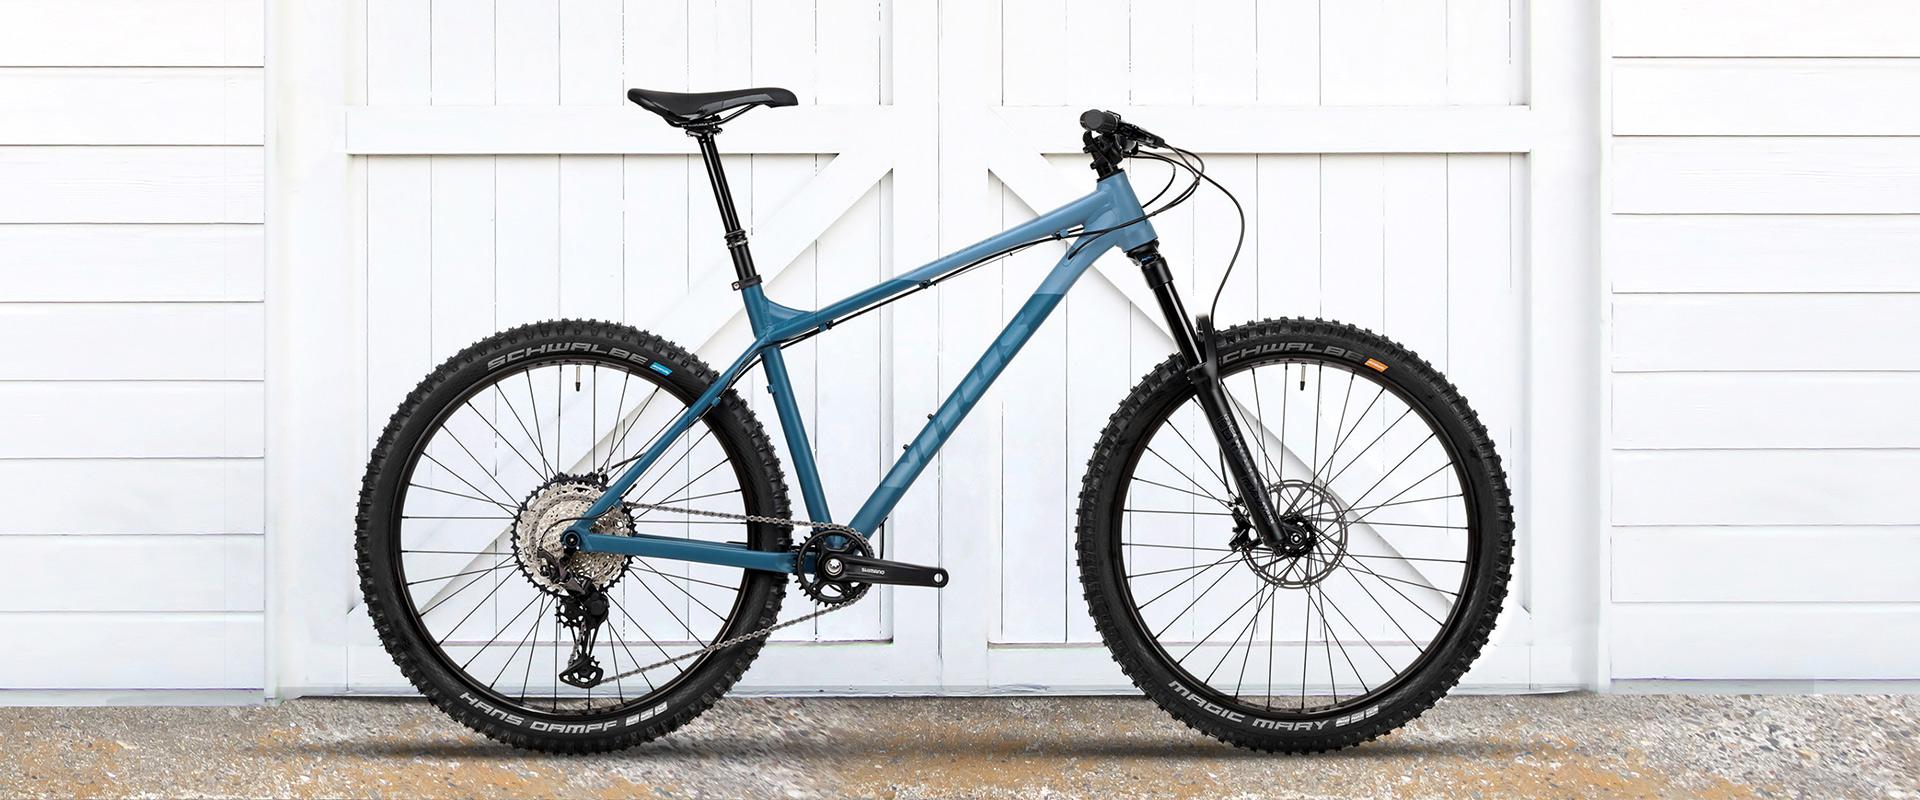 Sentier 27 VRS Bike XT SLX 1x12